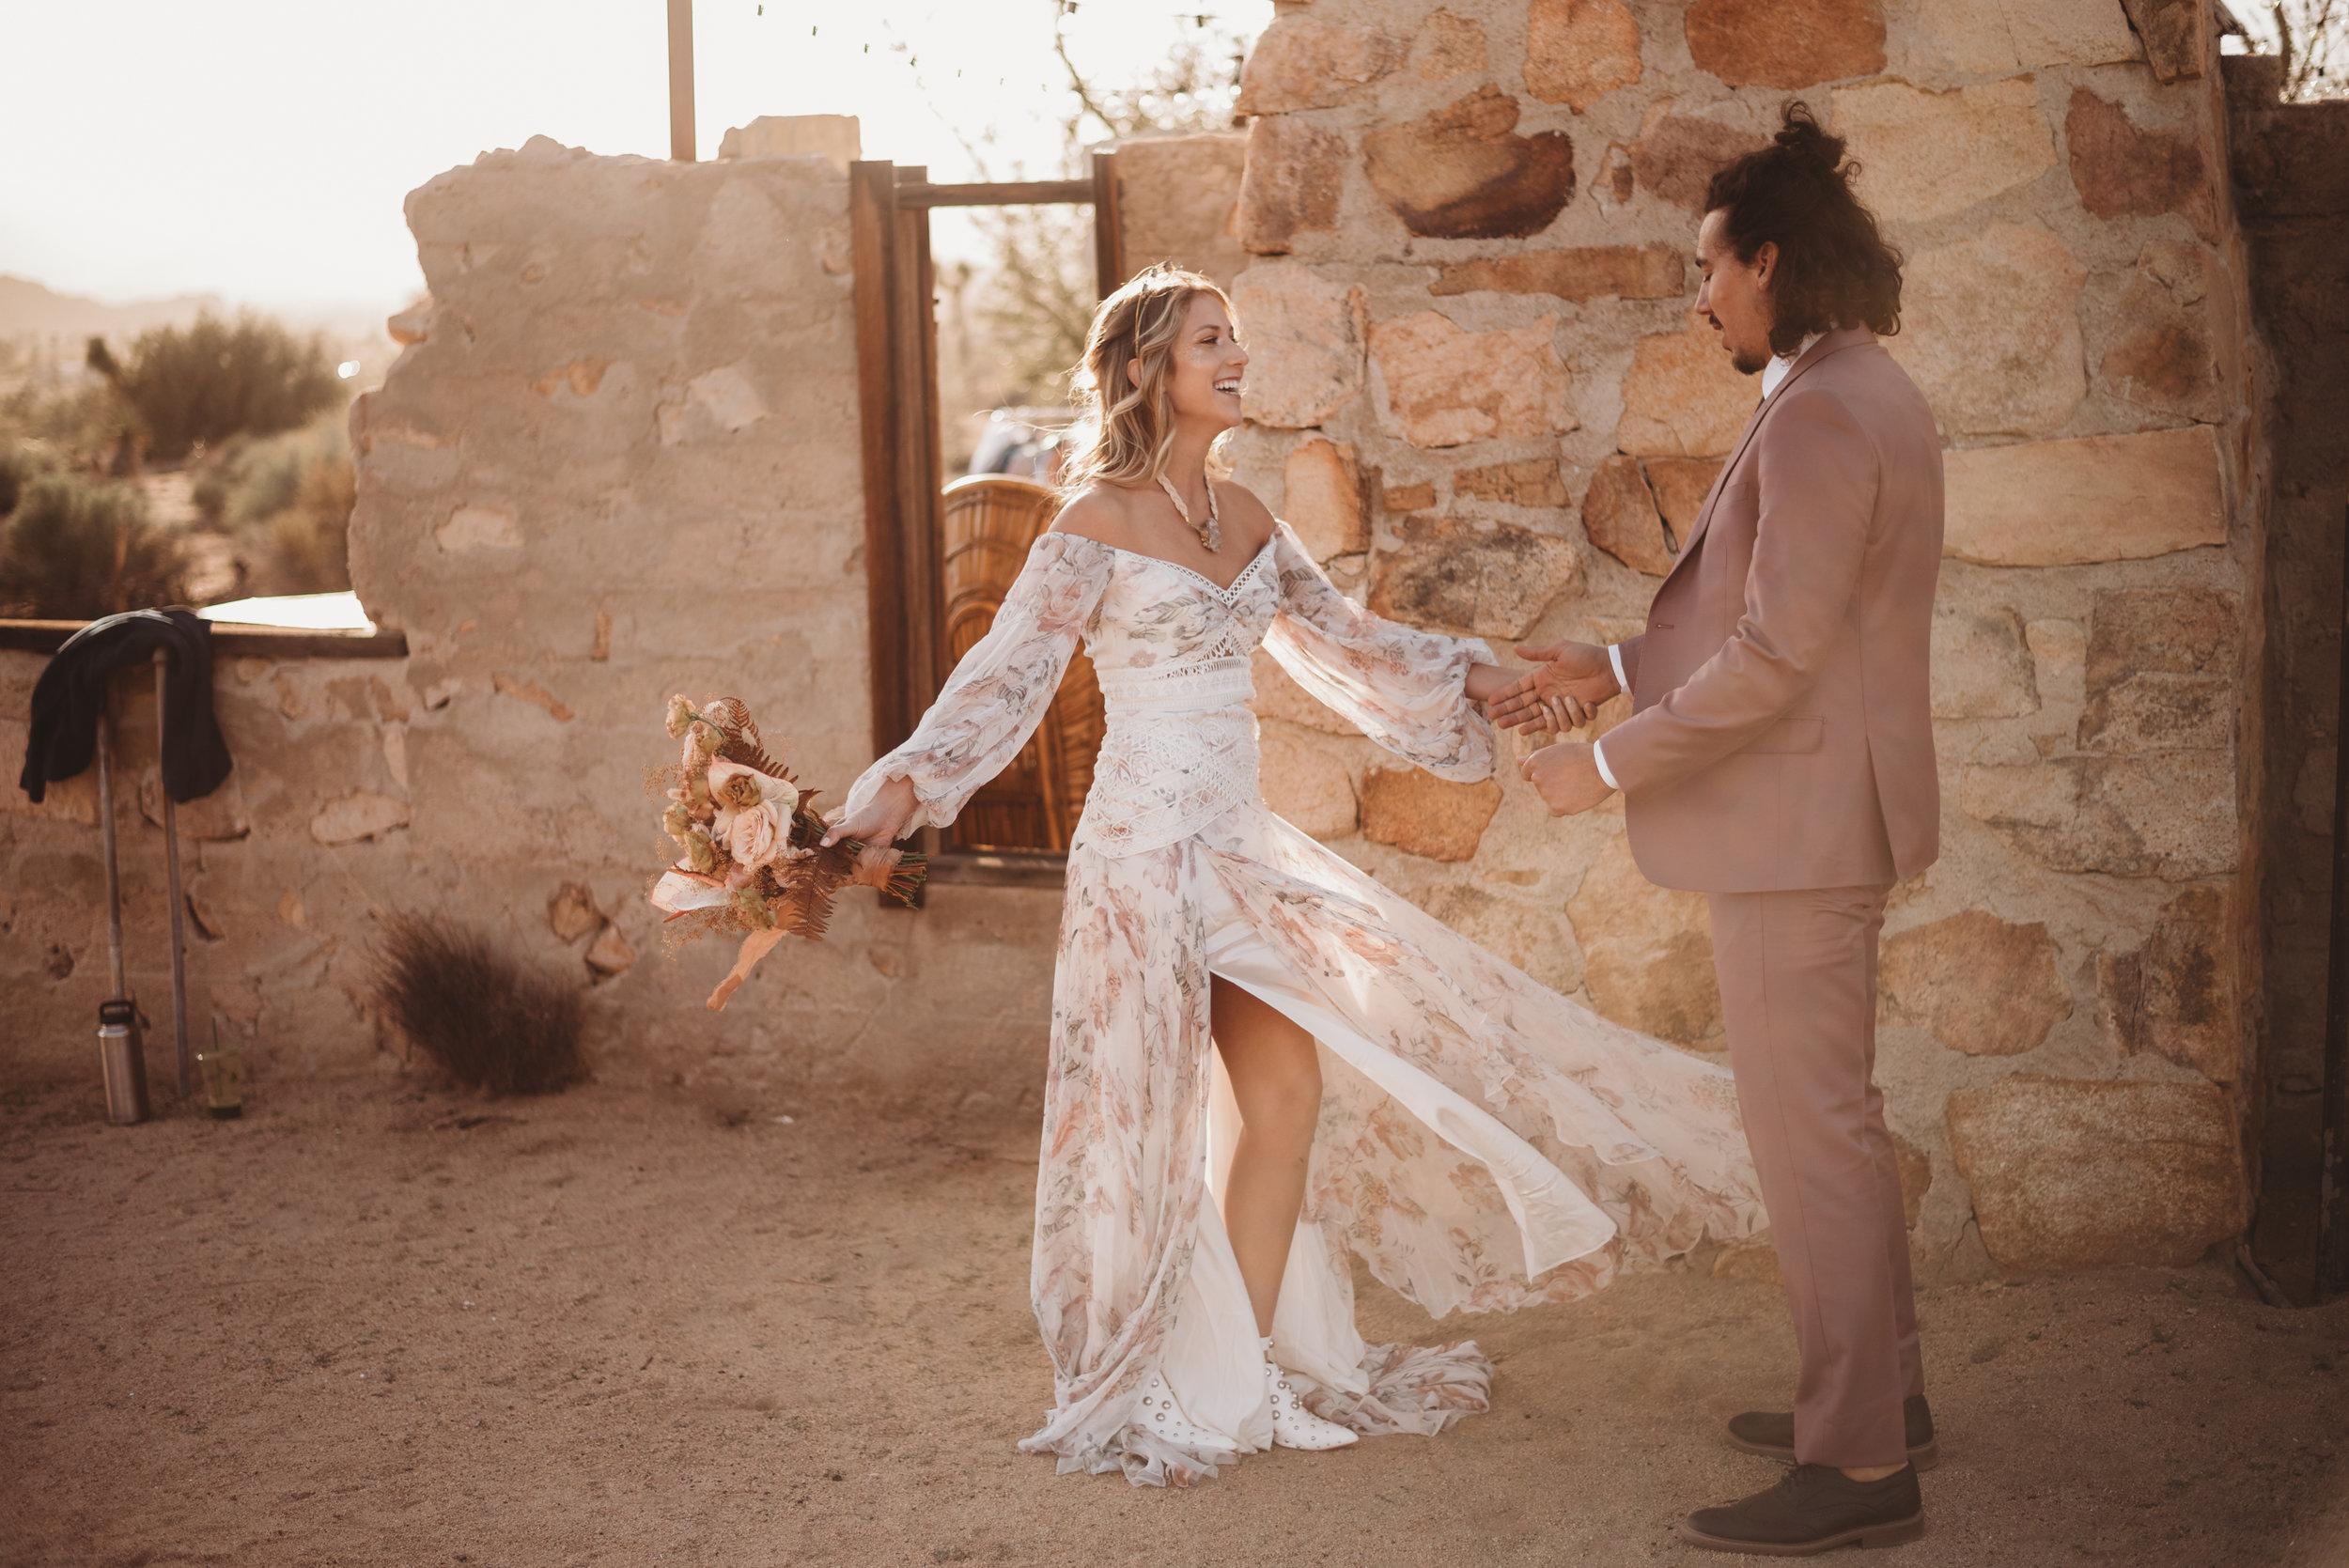 FortSt.John_photographer_TyraEPhotography_Wedding_Couple_Family_Photograhy_DawsonCreek_Elopement_Bride_Boduoir_Portraits-7686.jpg